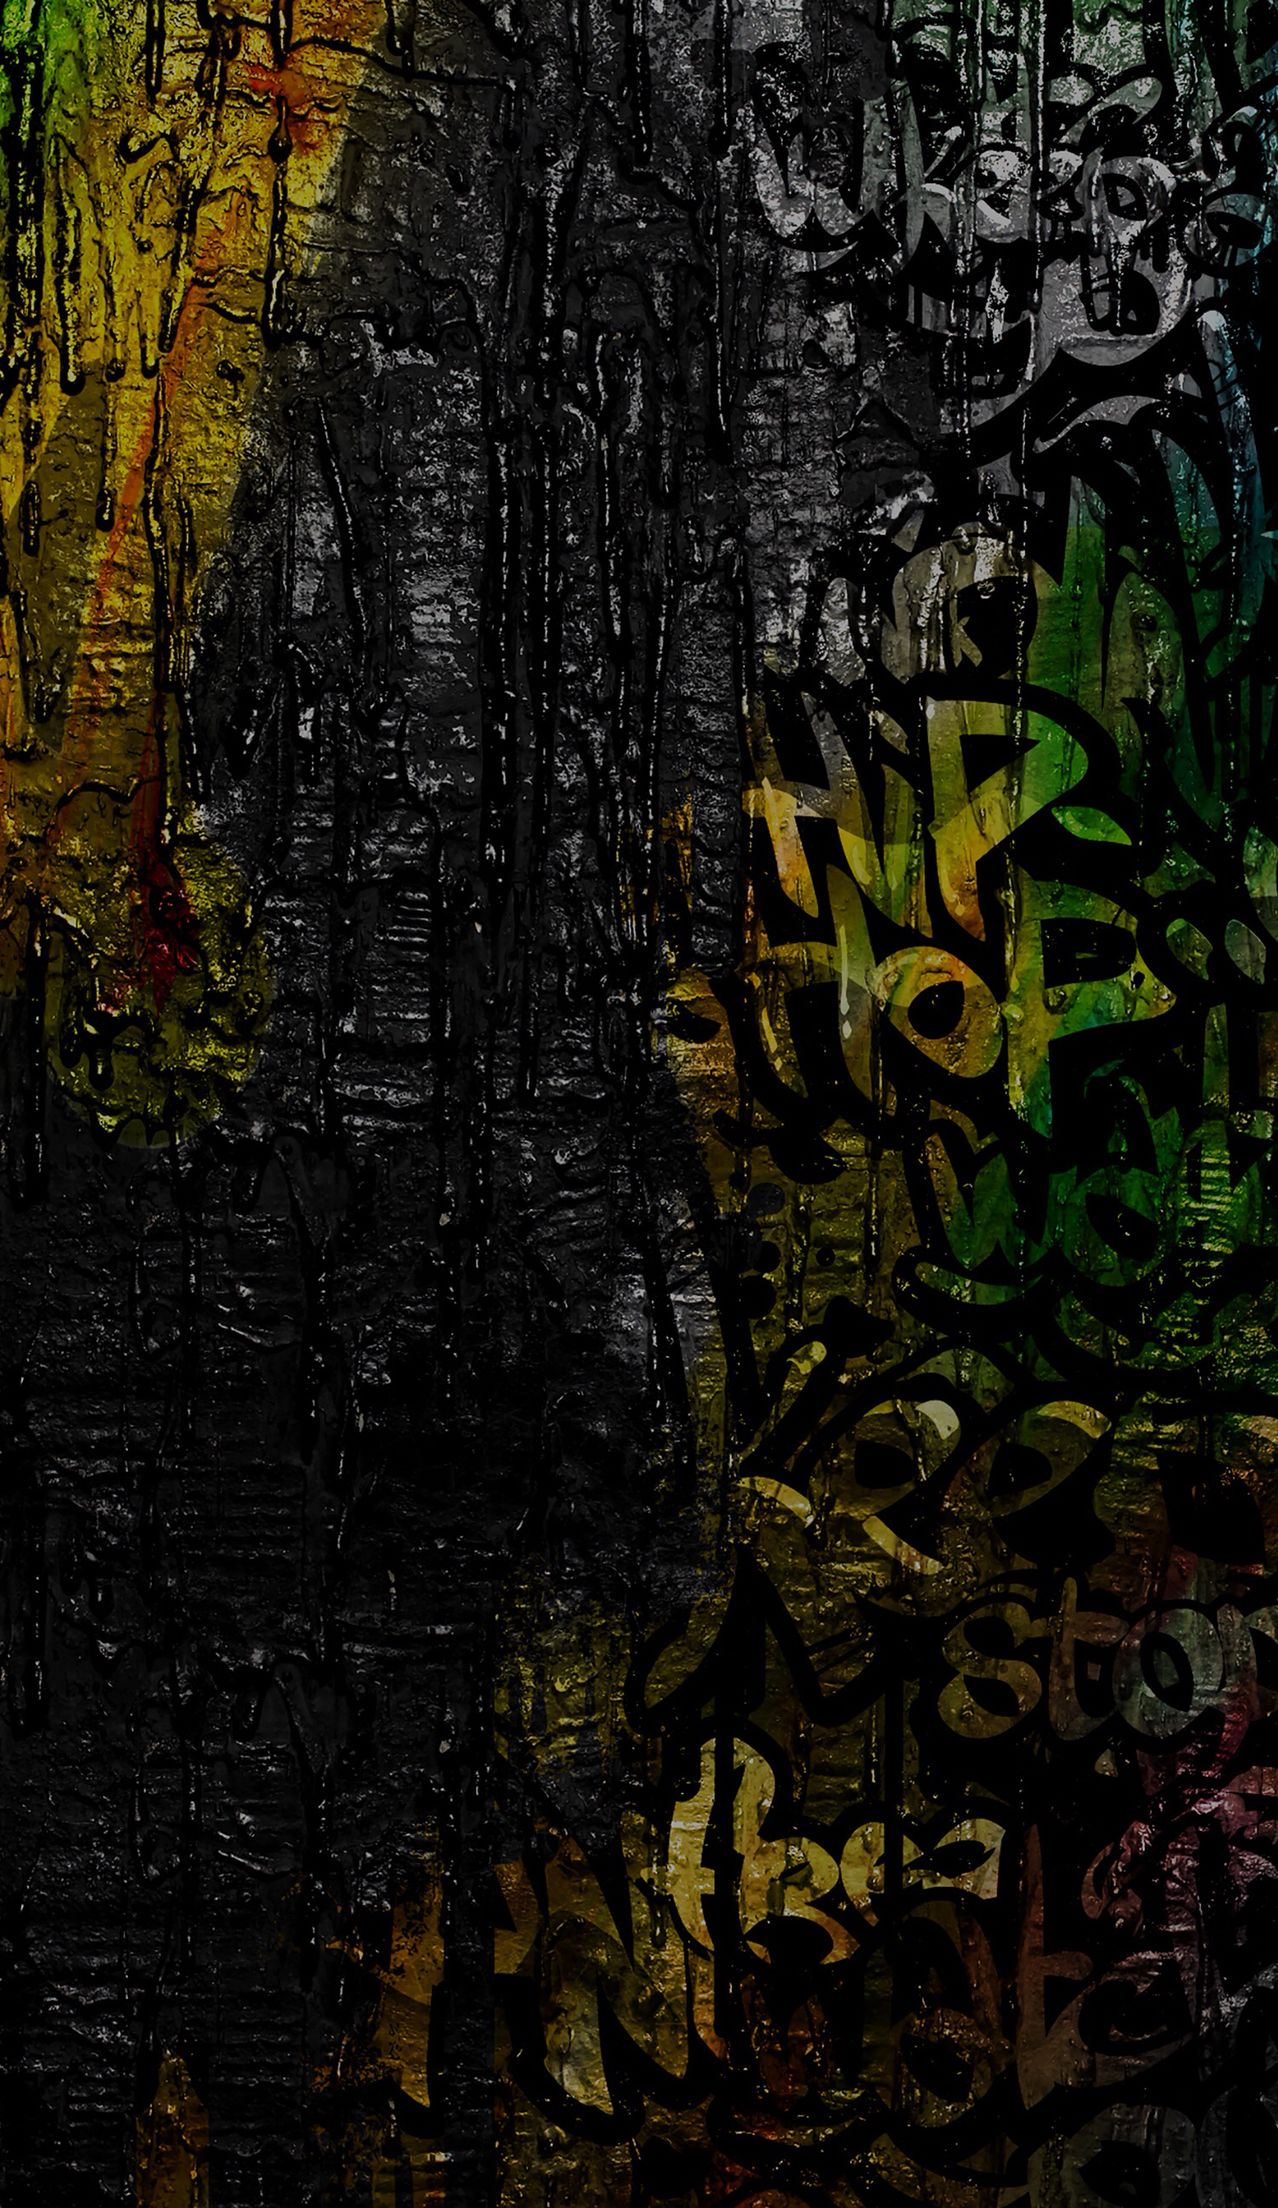 iPhone 6 Plus Wallpaper! Oneplus wallpapers, Graffiti